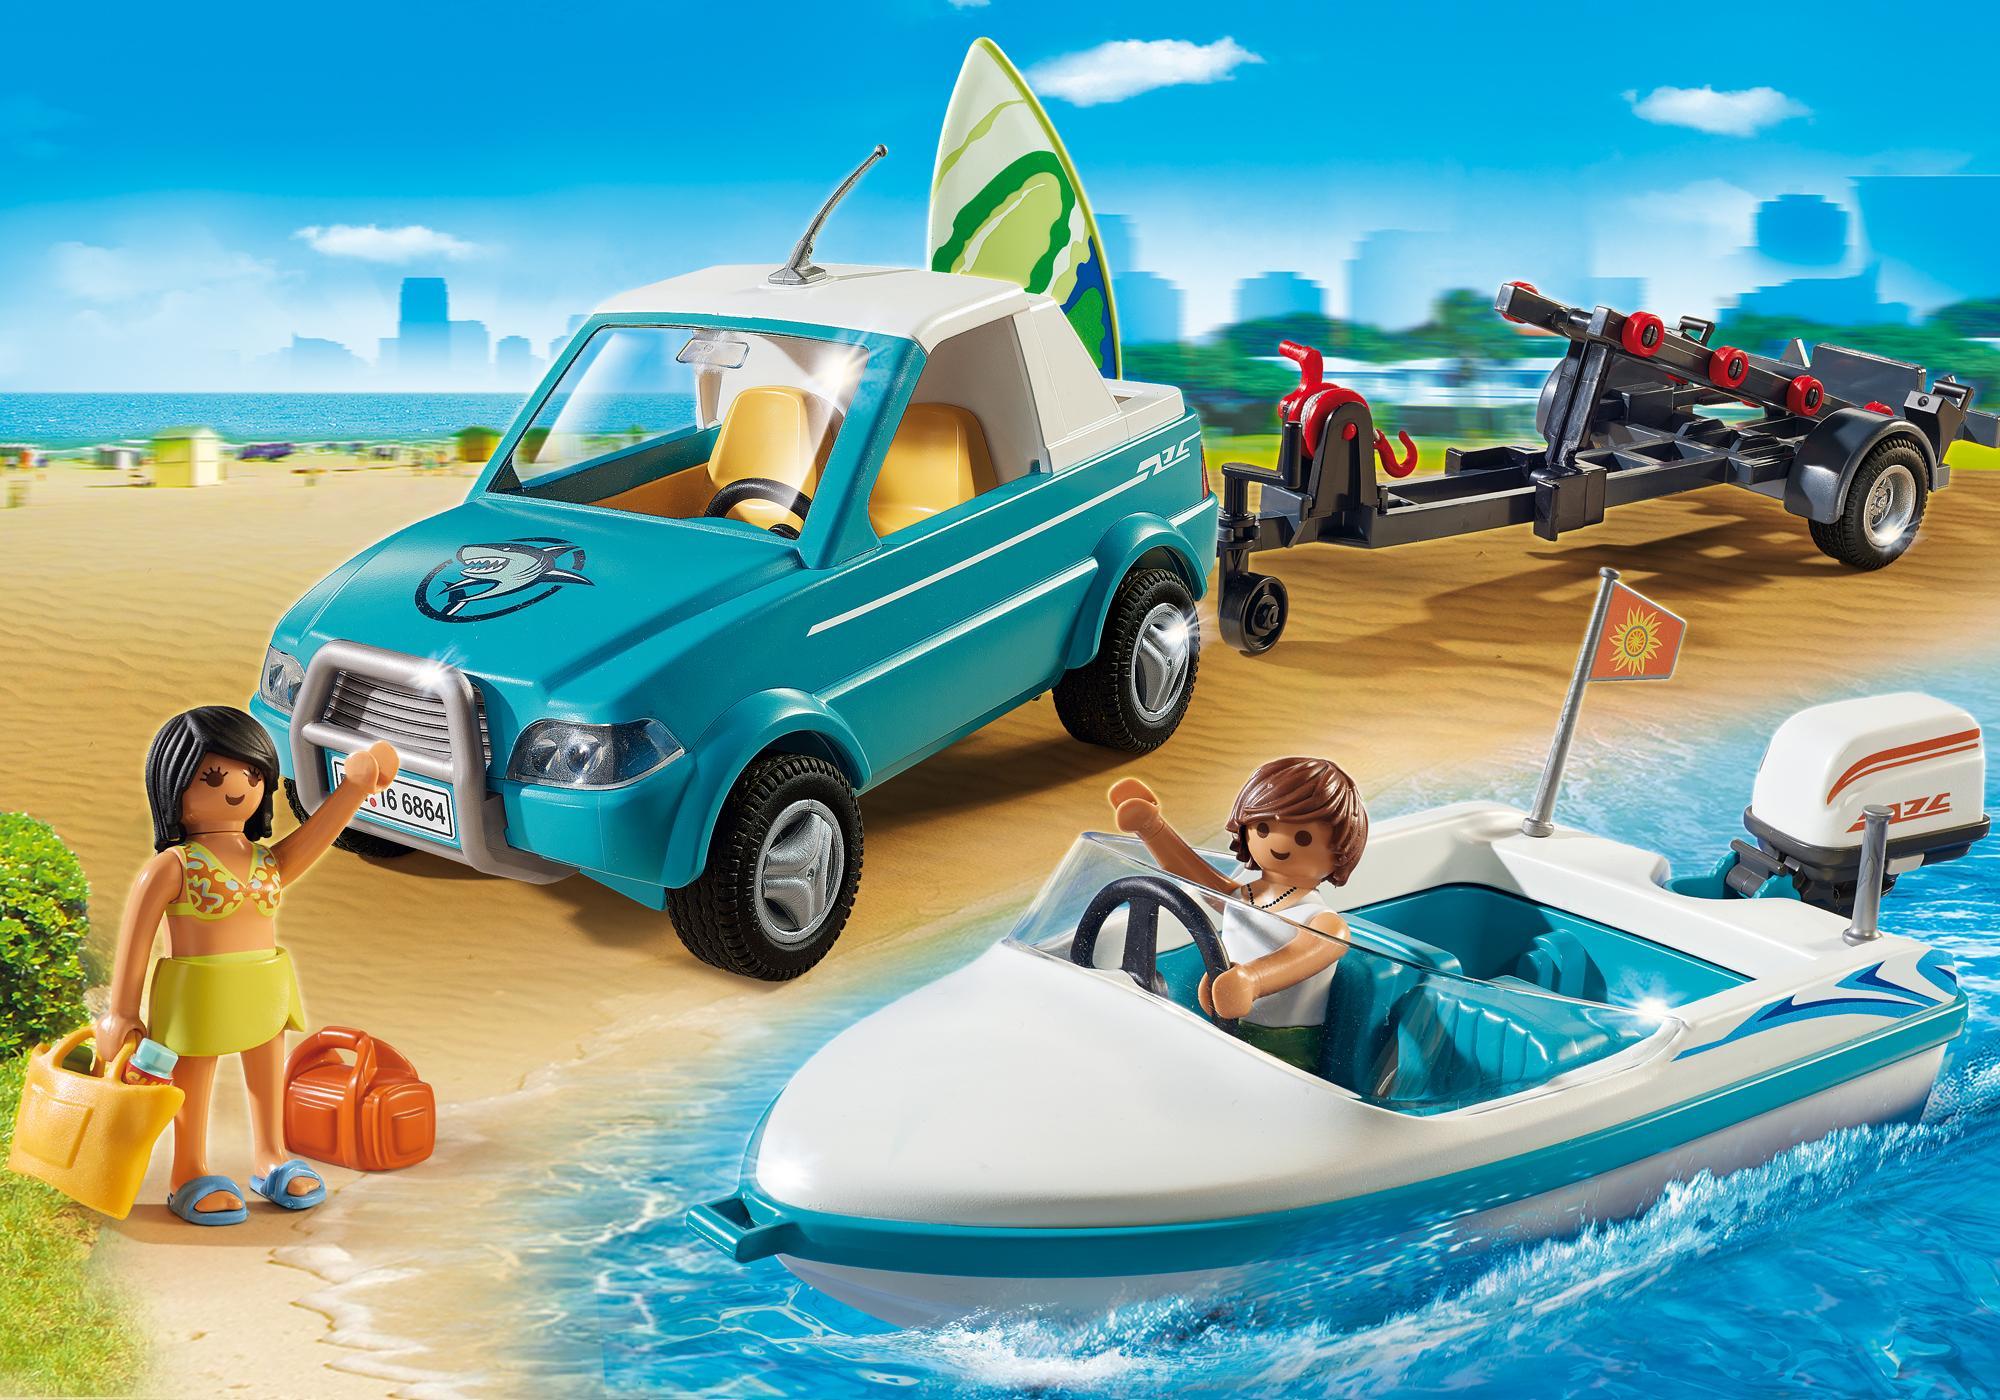 http://media.playmobil.com/i/playmobil/6864_product_detail